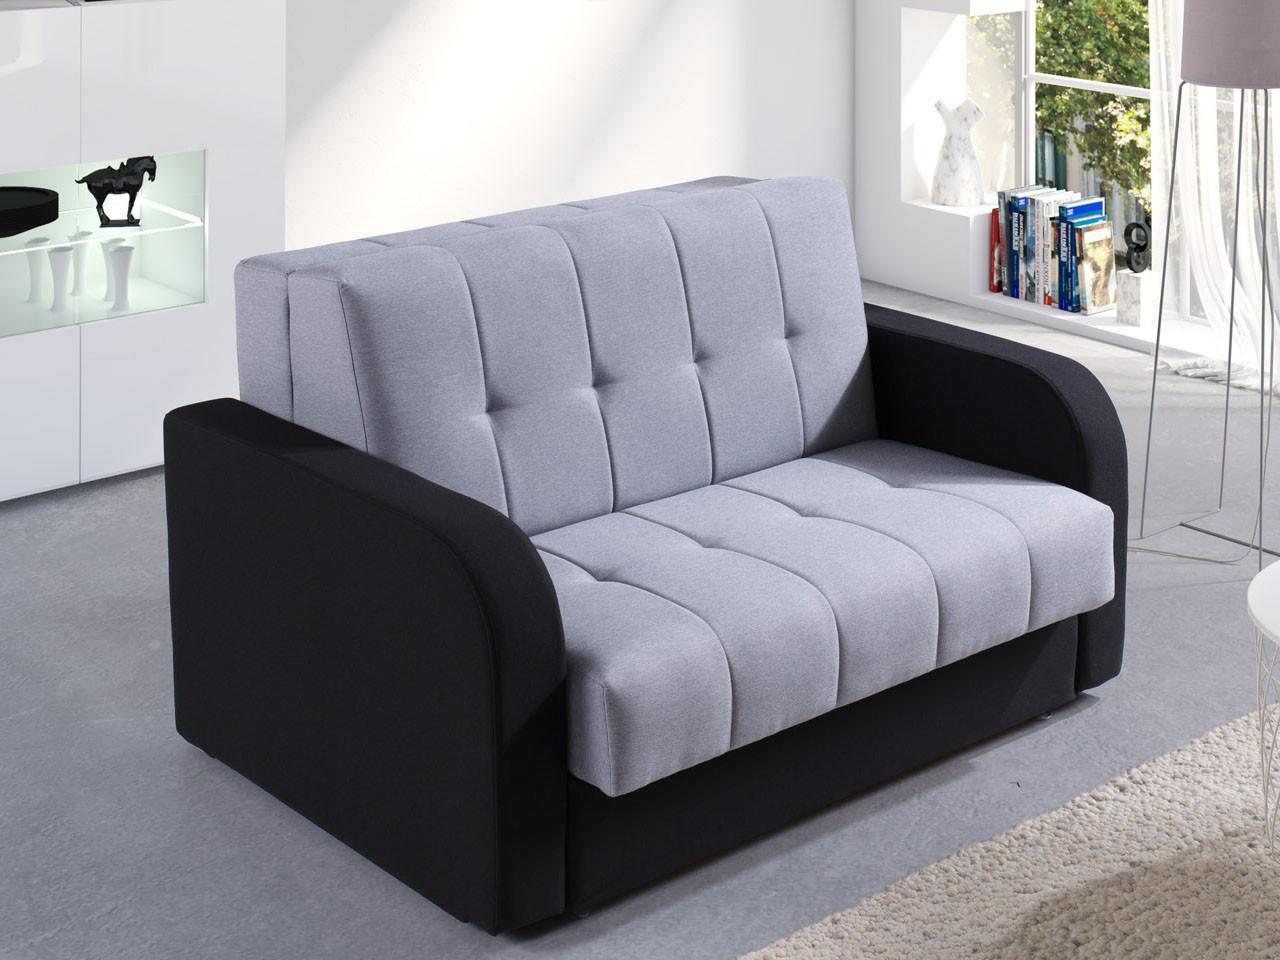 Sofa American Surano II mit Schlaffunktion - x-moebel24